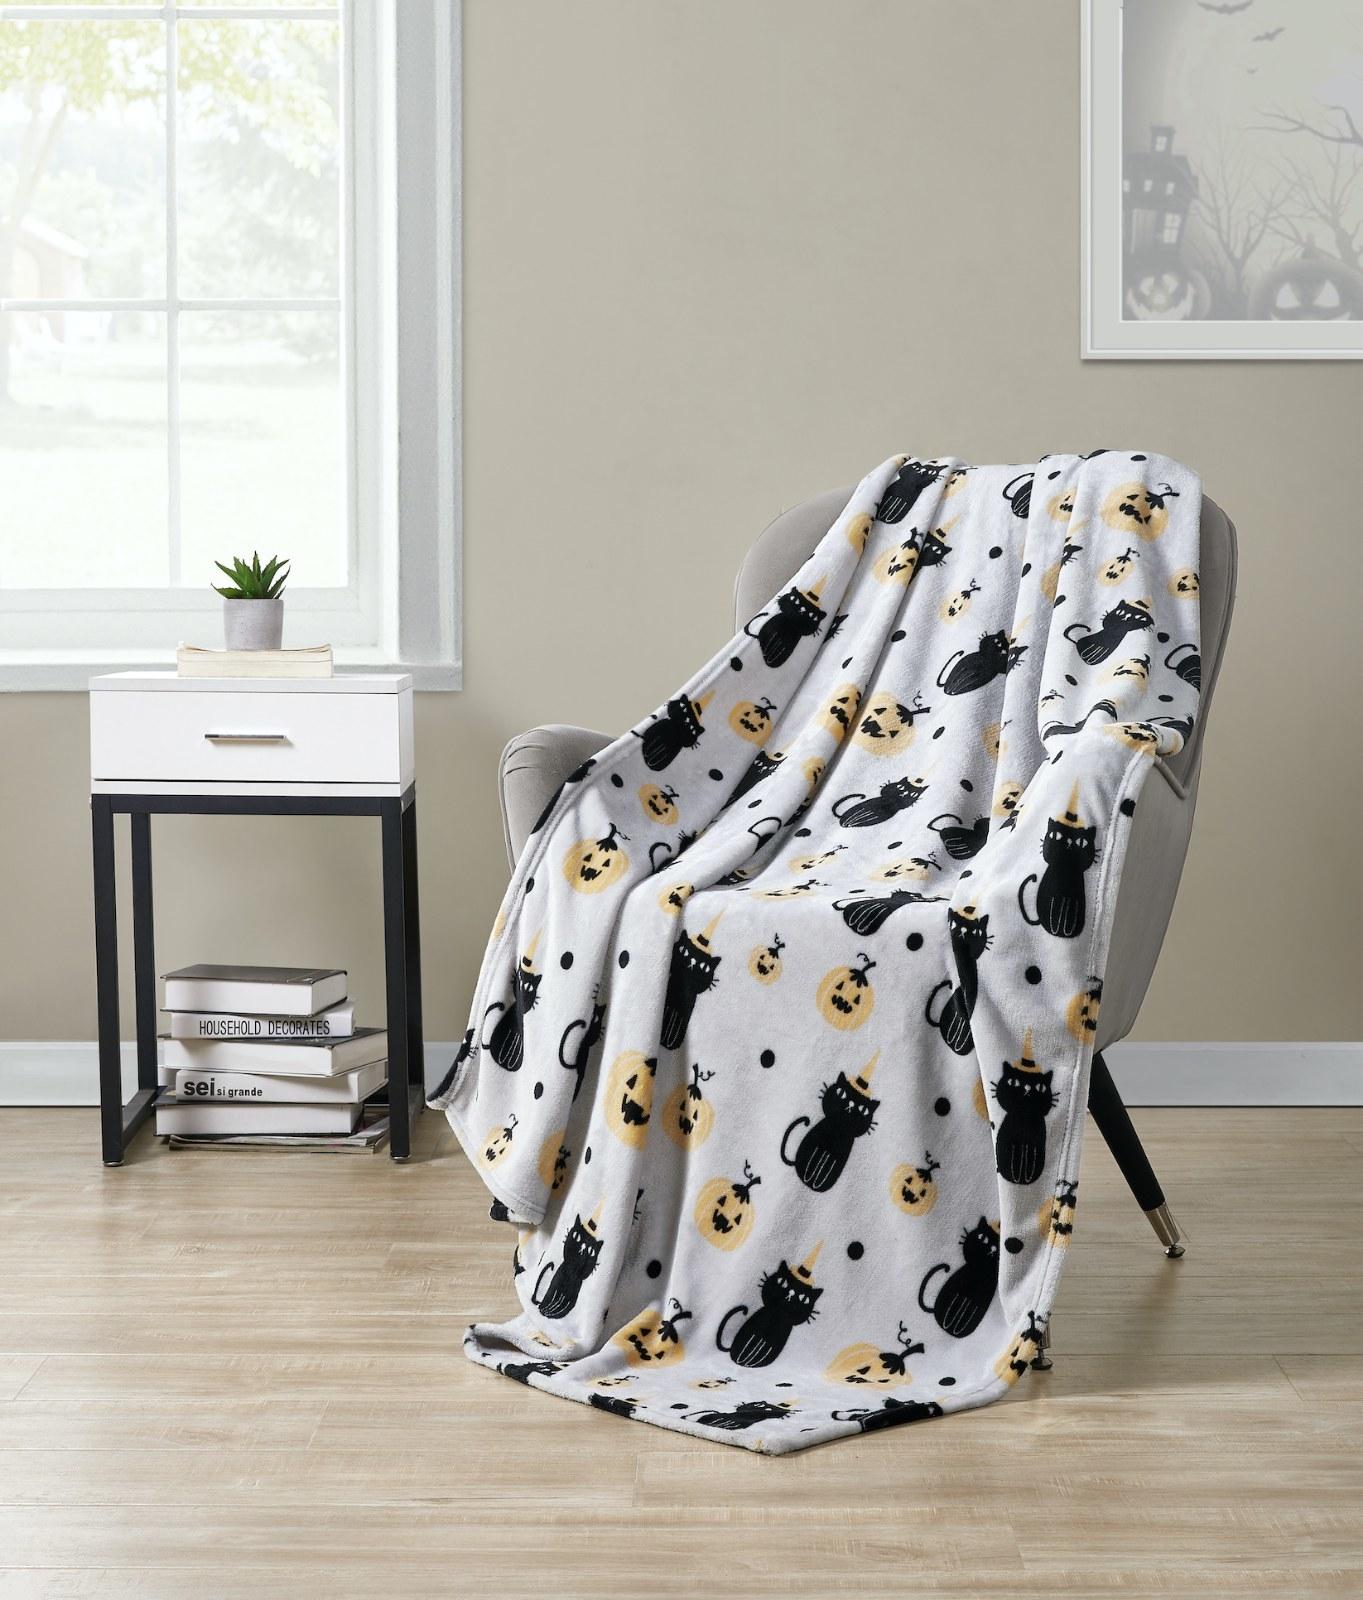 Halloween blanket displayed on armchair